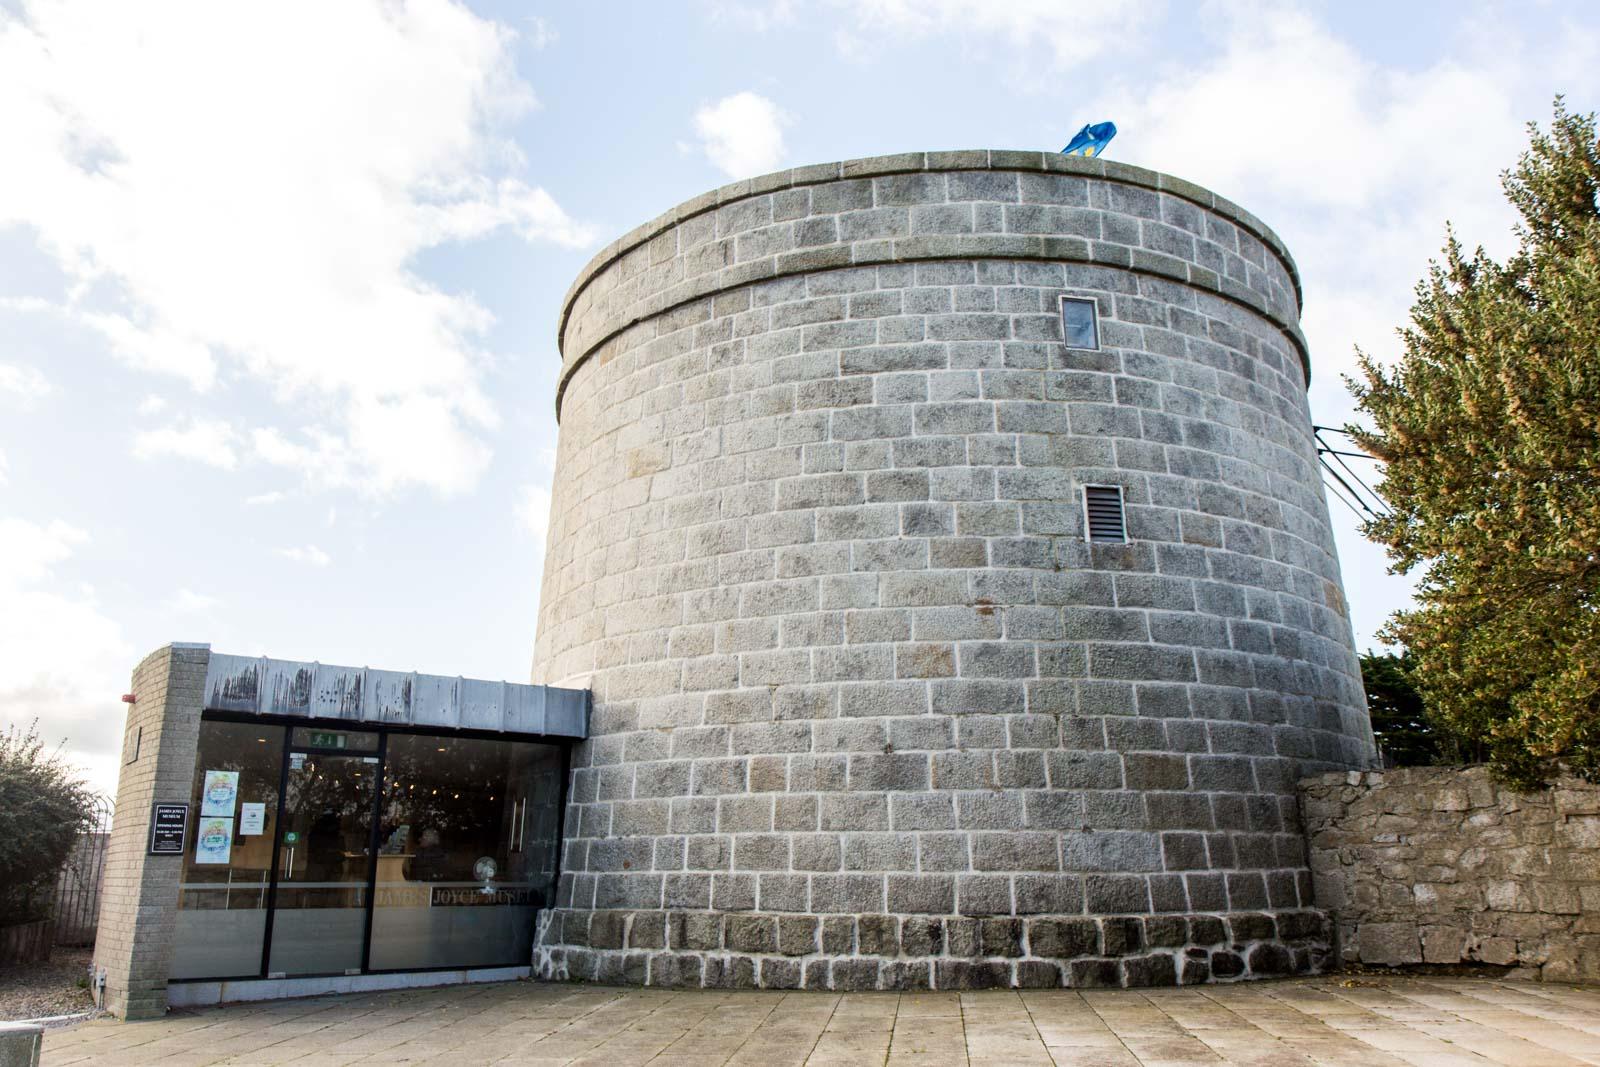 James Joyce Tower, Dublin, Ireland